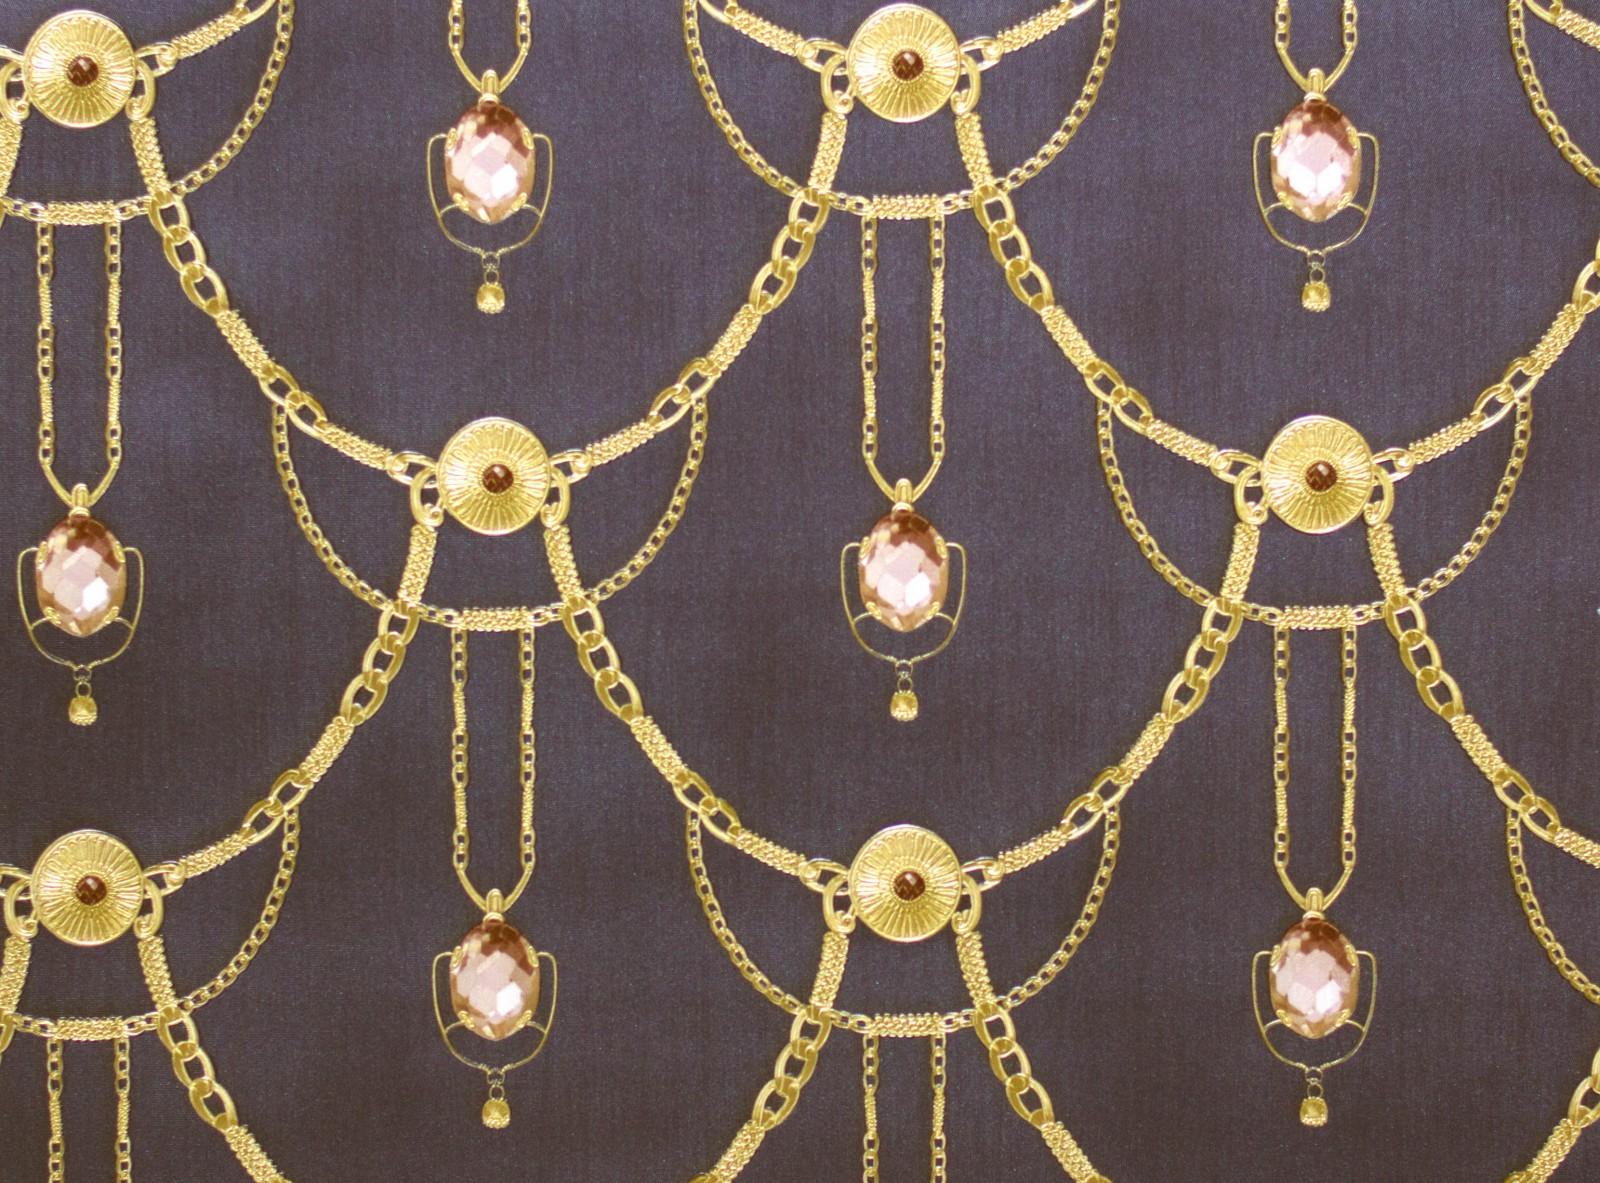 vliestapete grafik braun gold as creation 94353 5. Black Bedroom Furniture Sets. Home Design Ideas